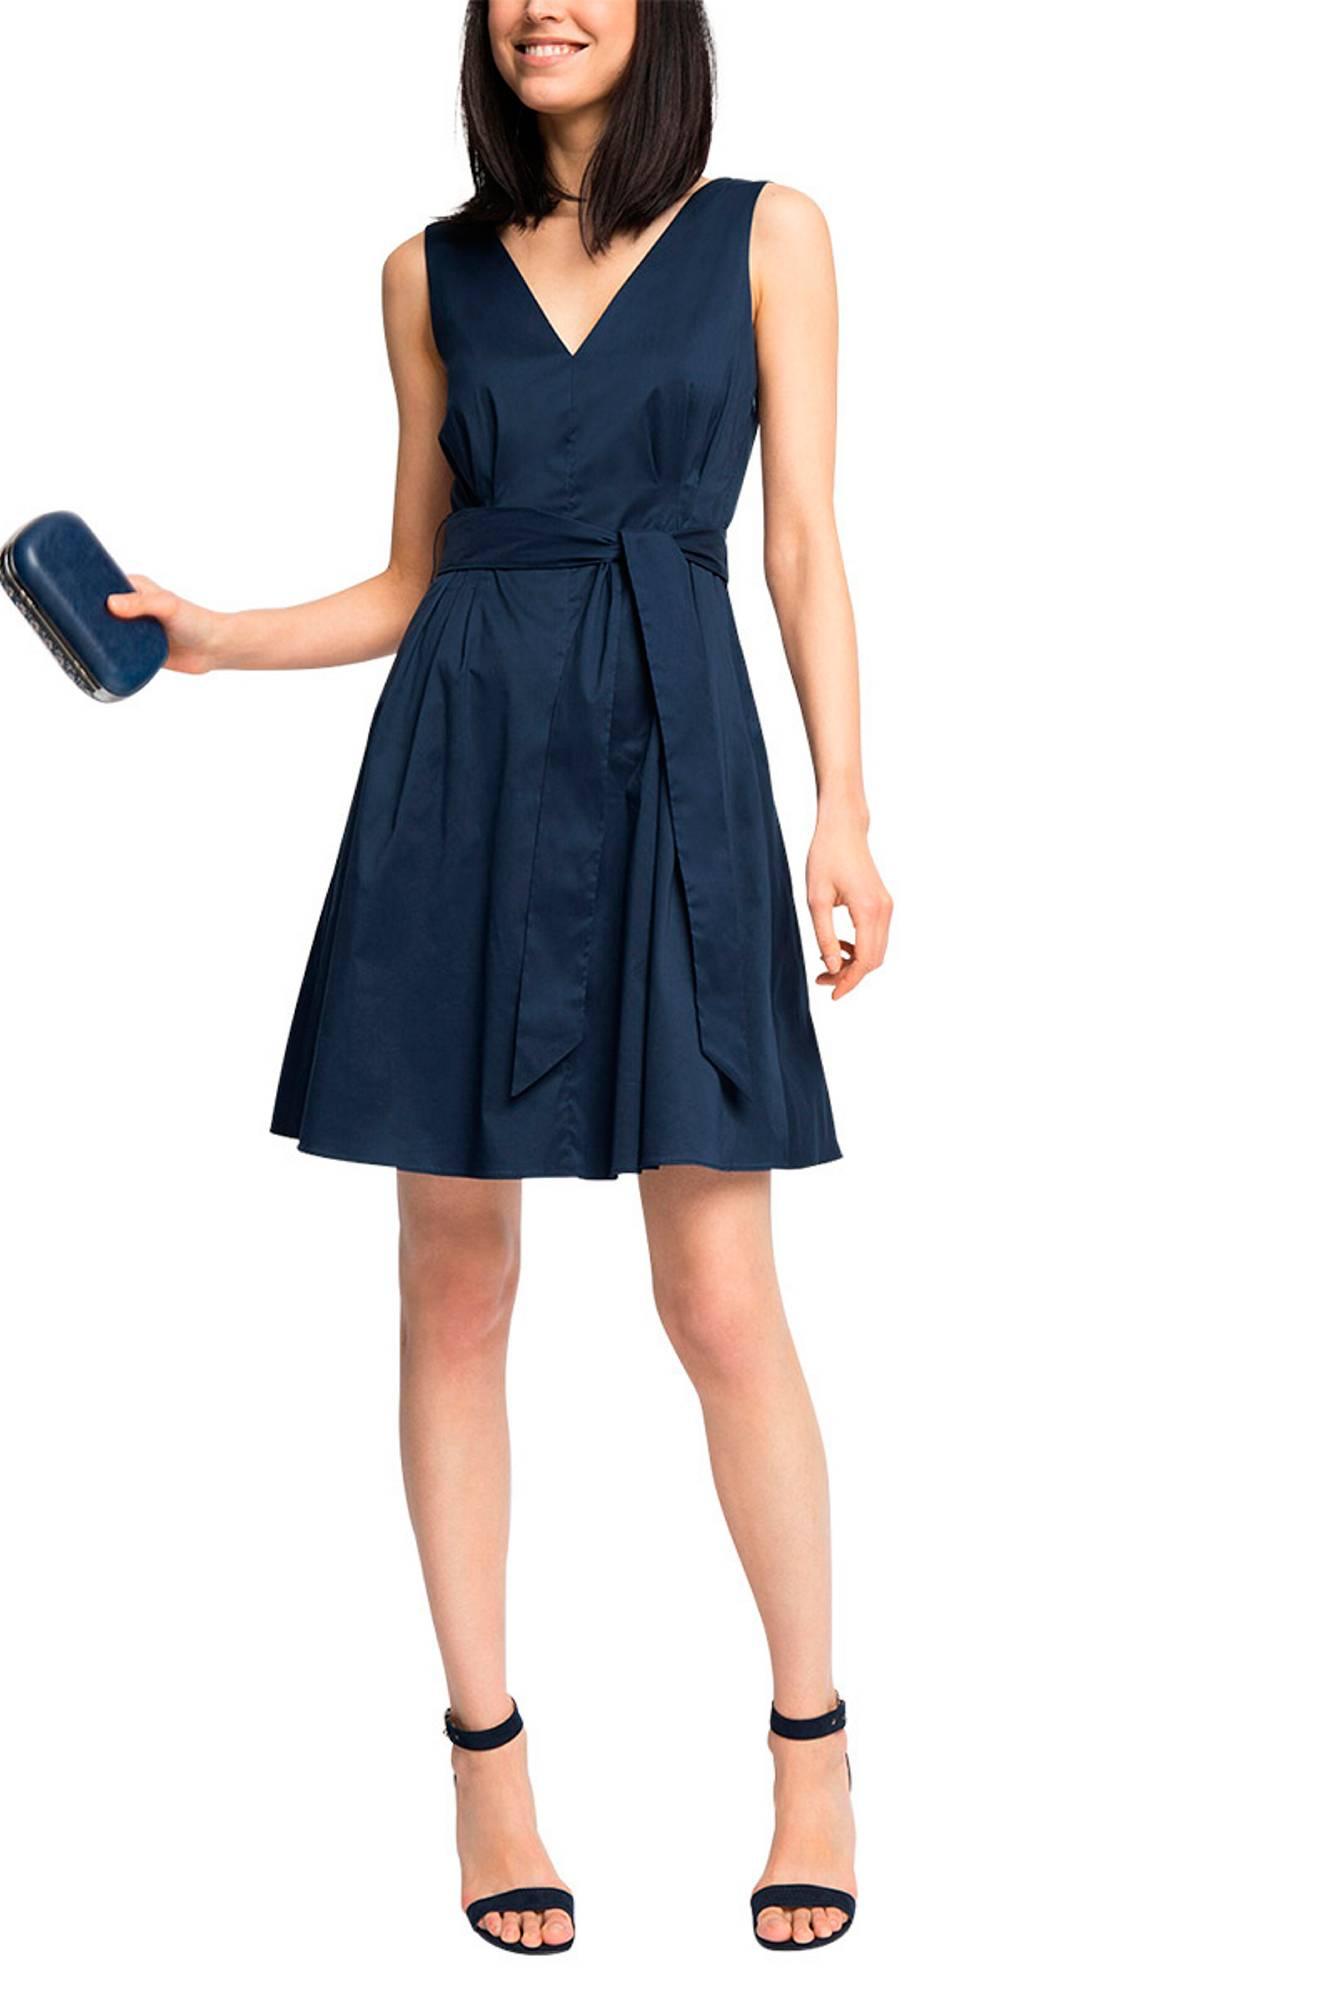 Kjole ærmeløs Esprit Kjoler til Kvinder i Marineblå